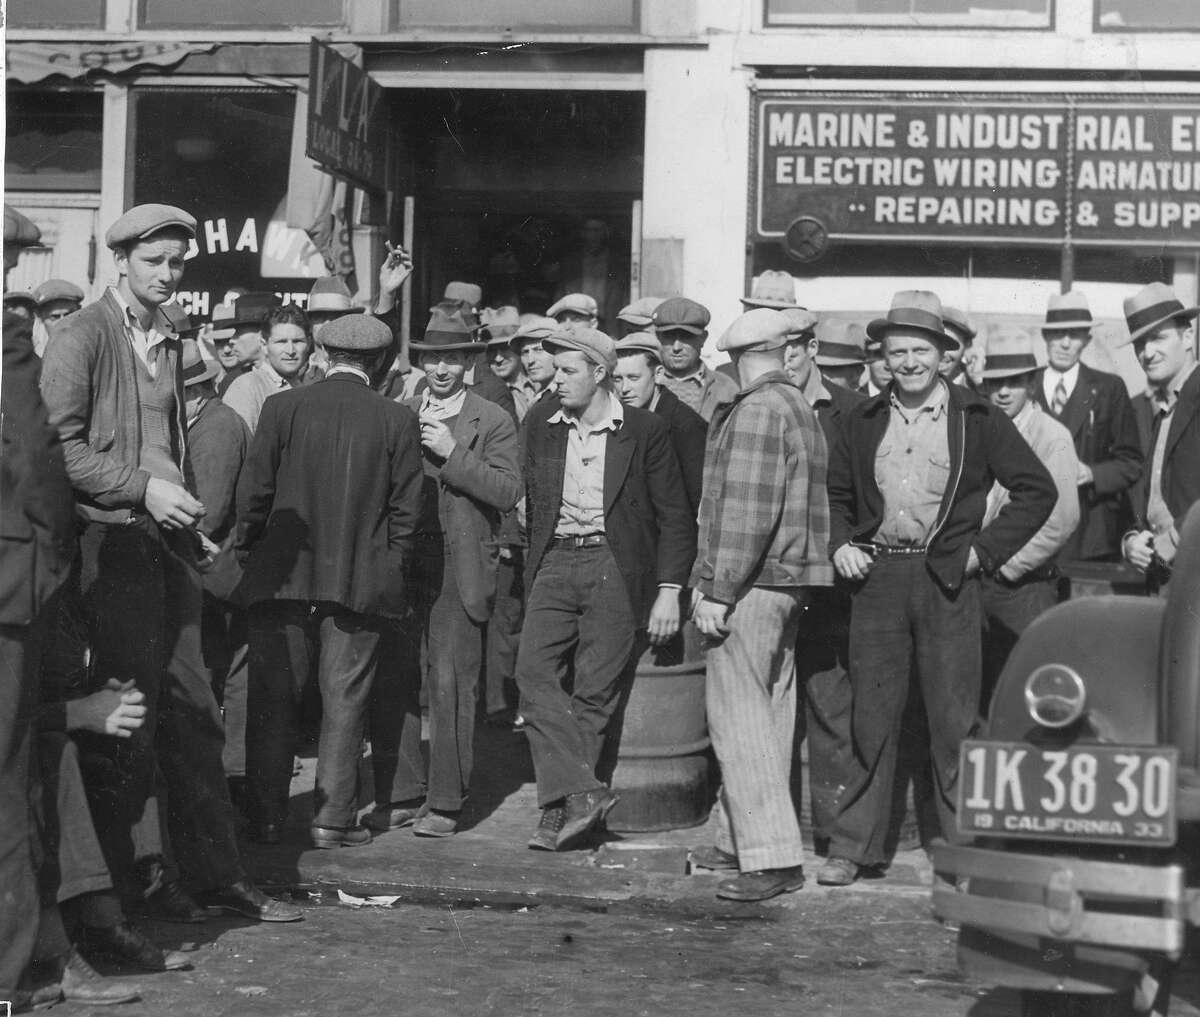 San Francisco longshoremen on strike, October 19, 1933